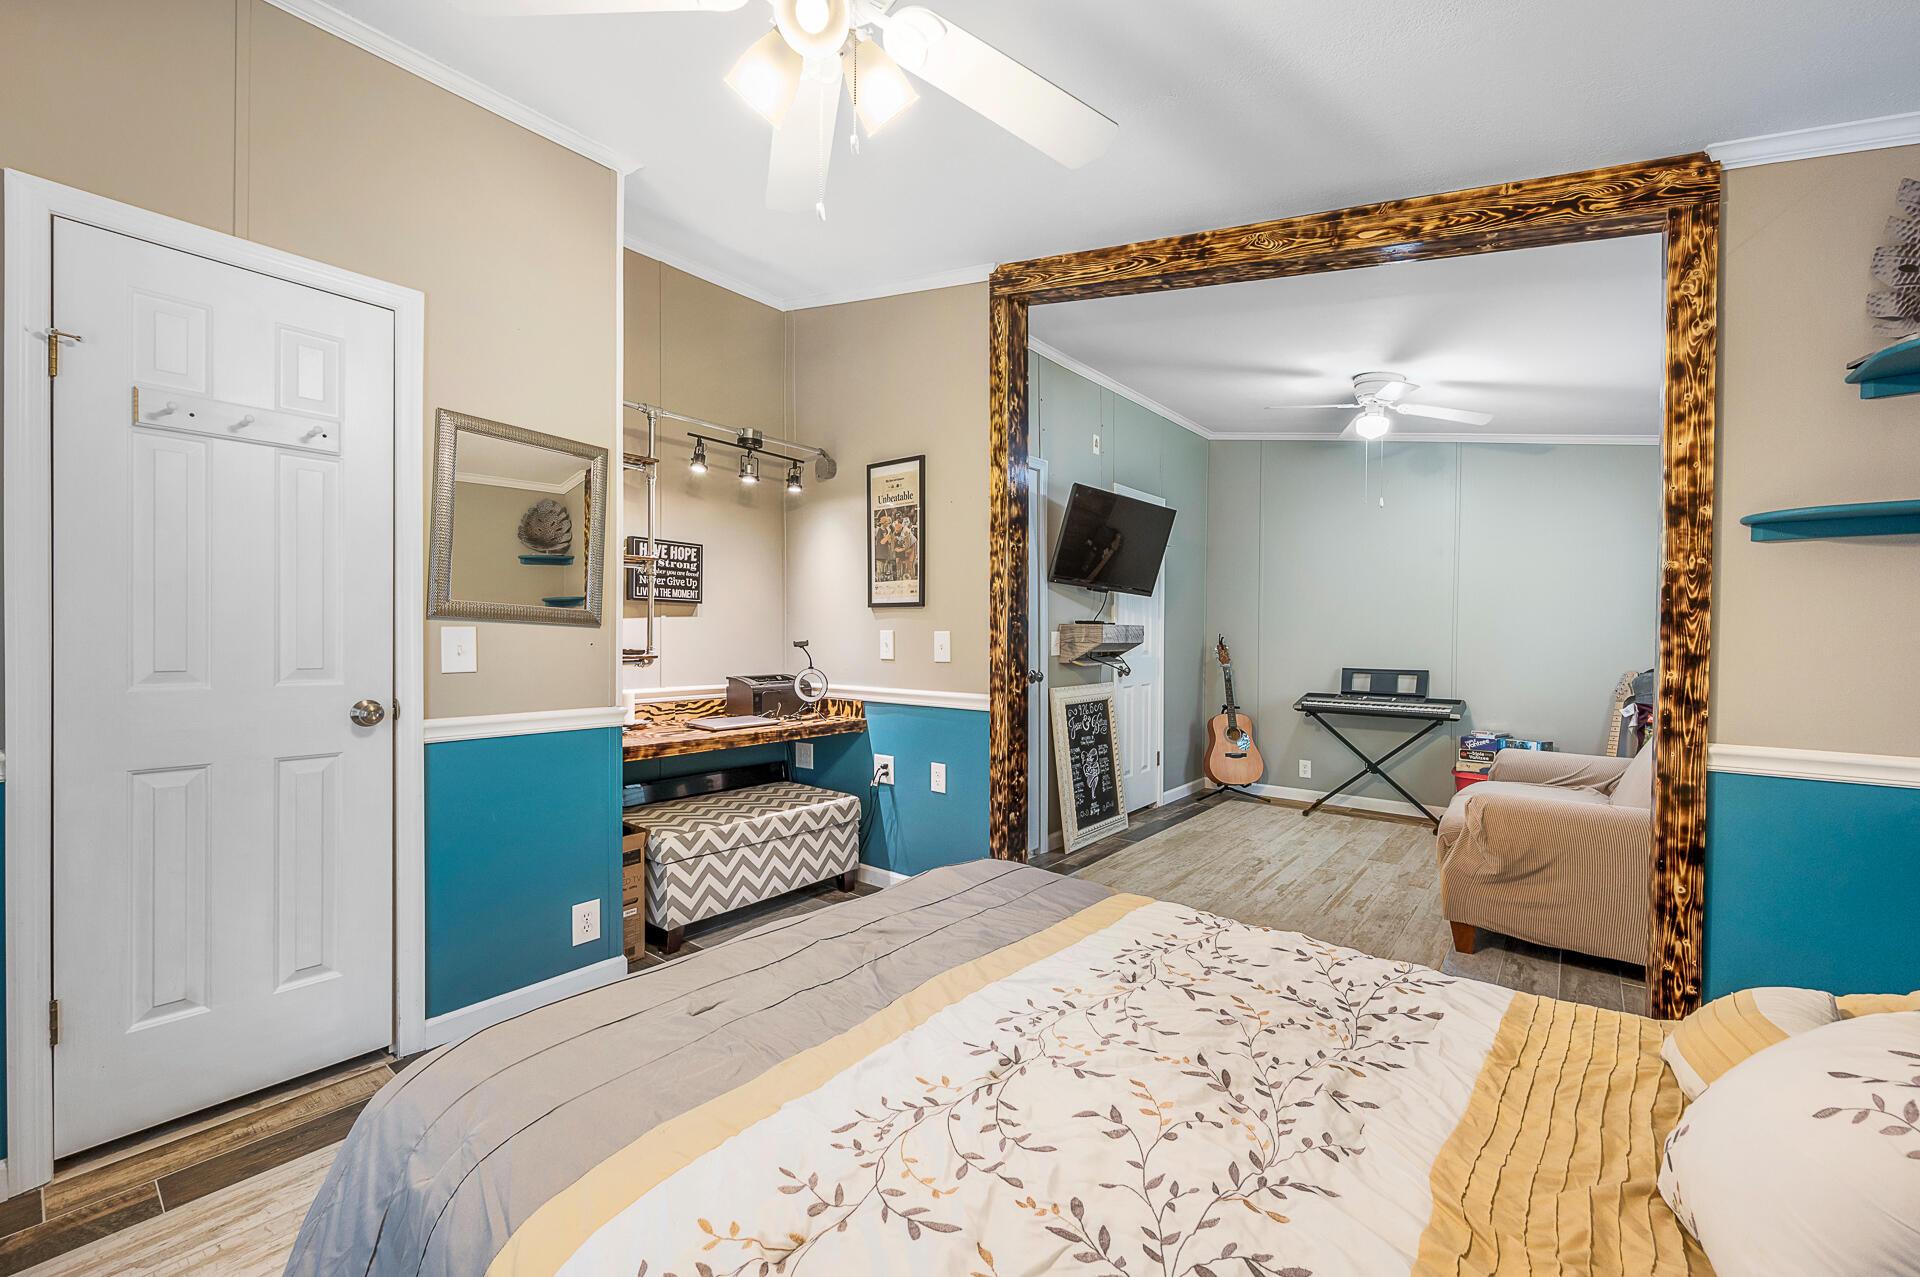 Clemson Terrace Homes For Sale - 250 Medina, Summerville, SC - 17